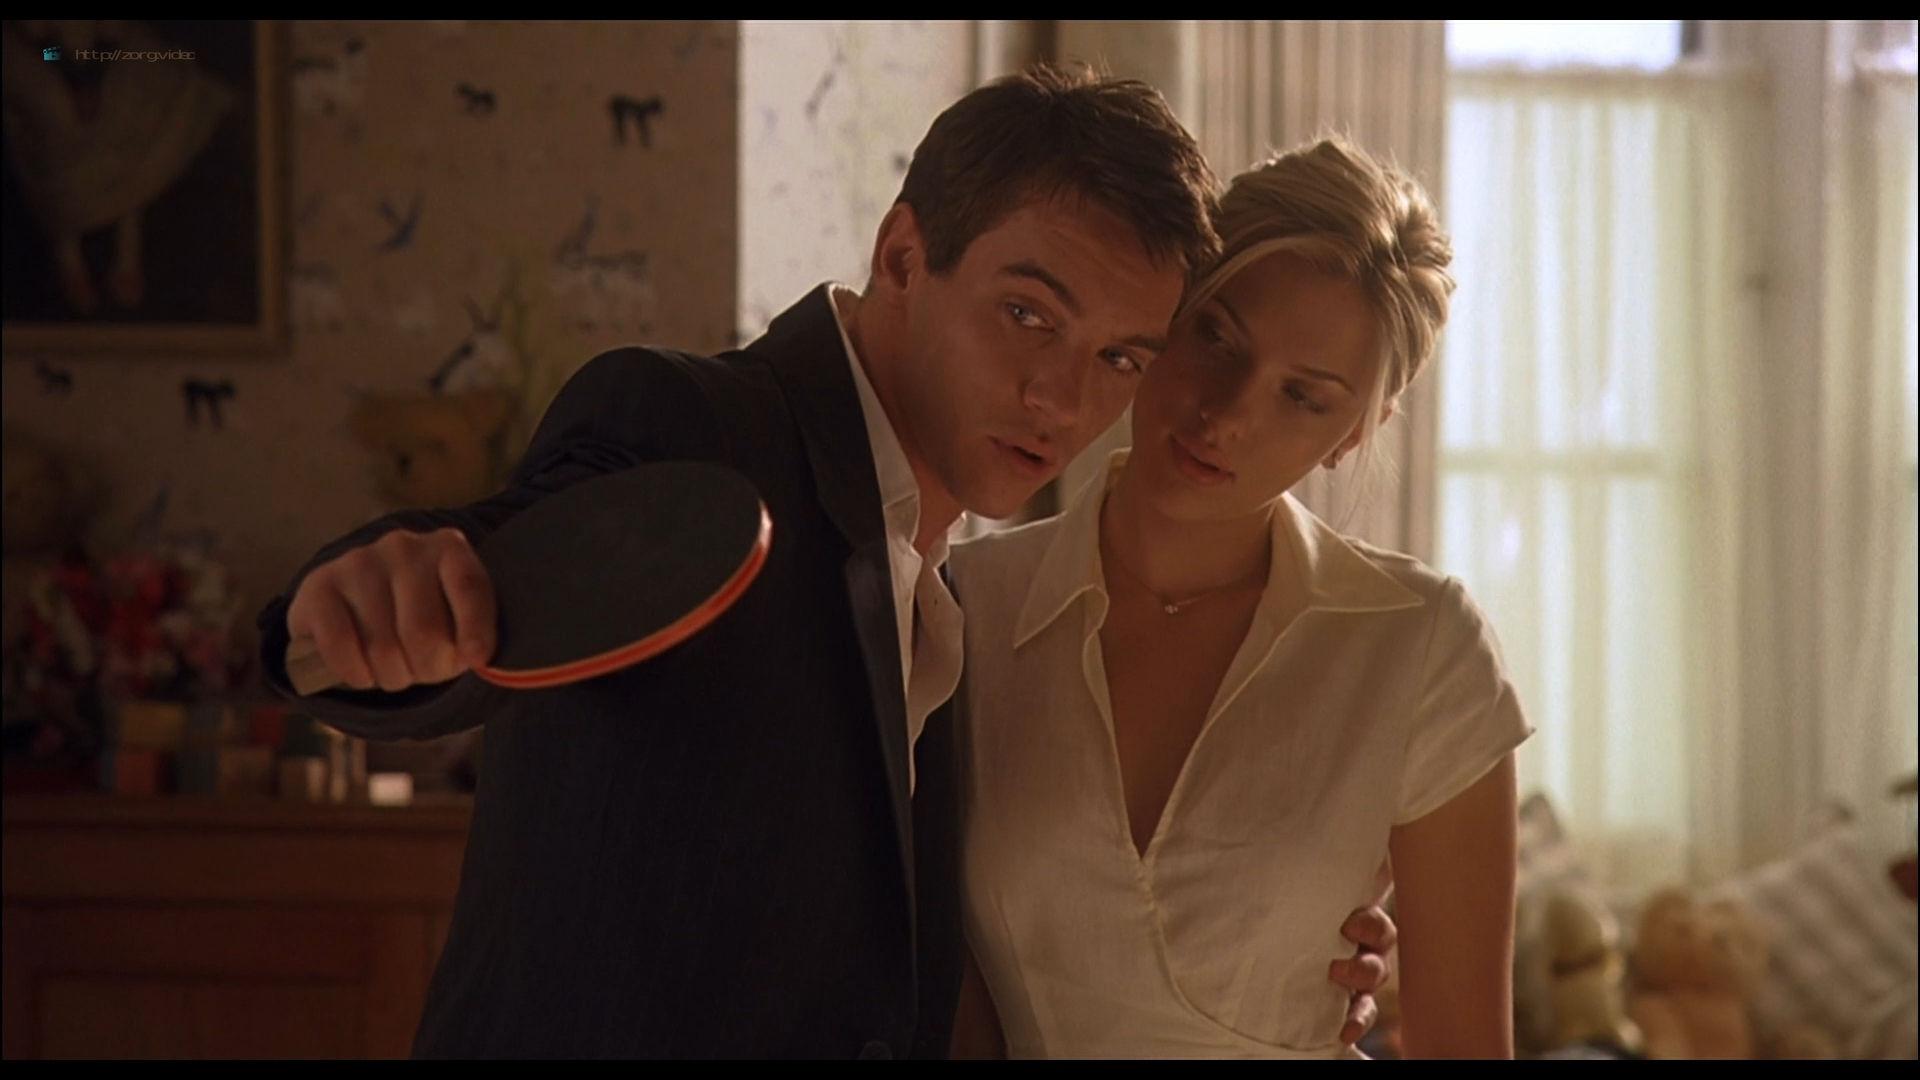 Scarlett Johansson see through and sex - Match Point (2005) HD 1080p BluRay (19)